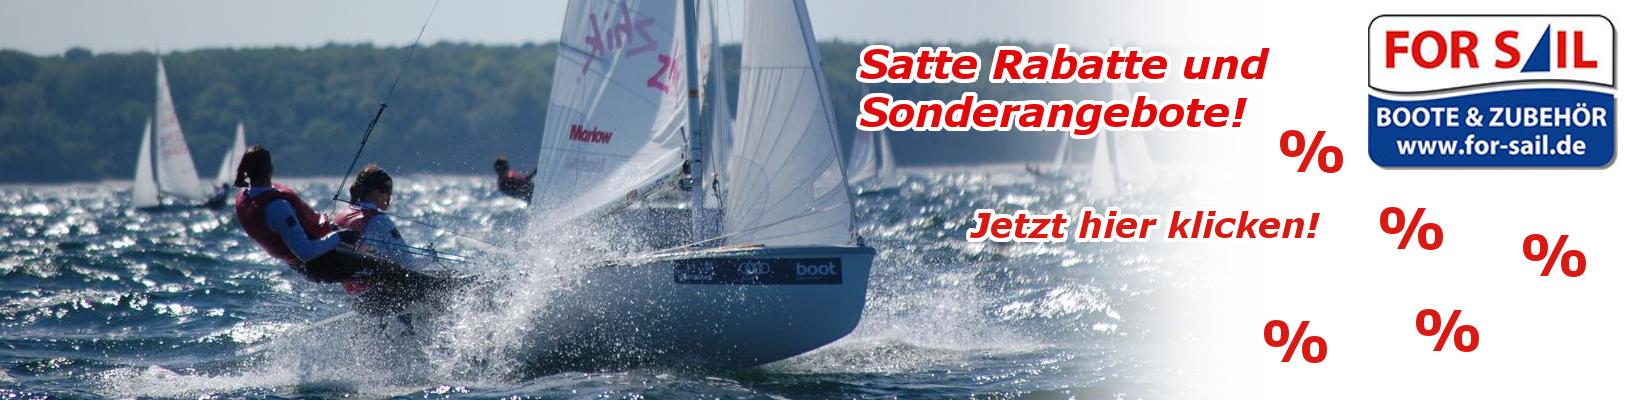 Sonderangebote For-Sail.de